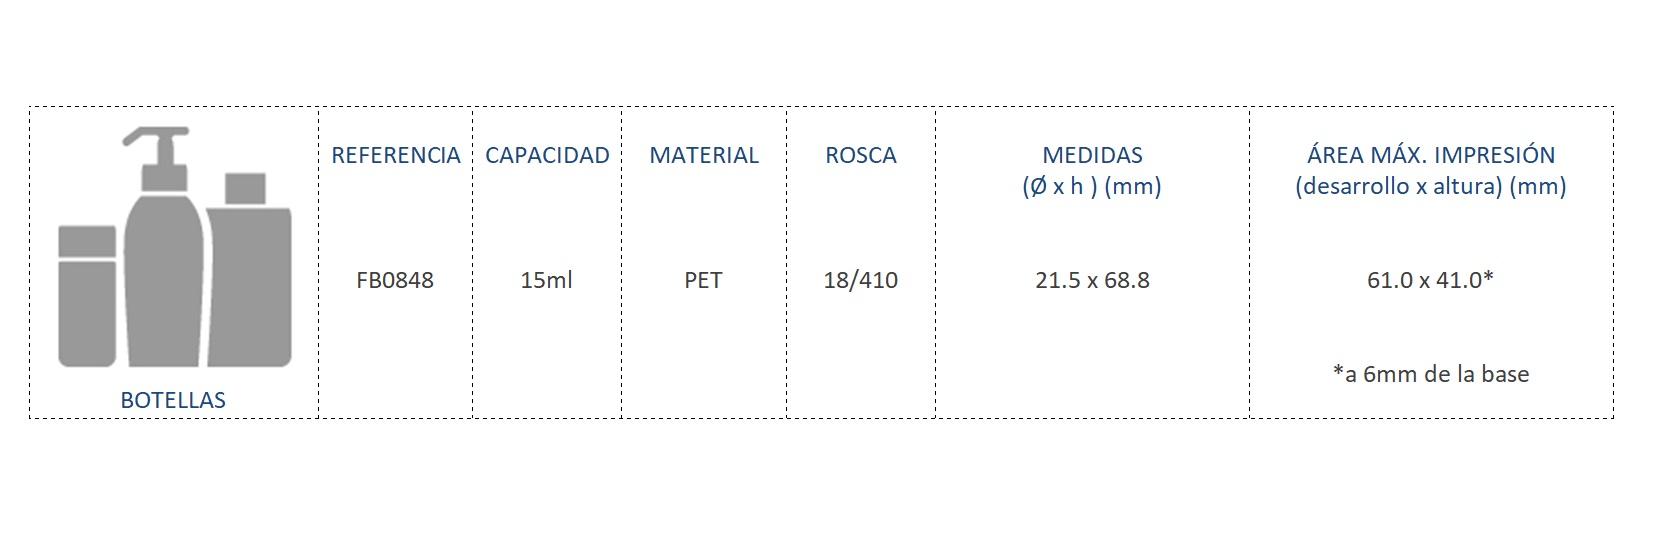 Cuadro de materiales FB0848